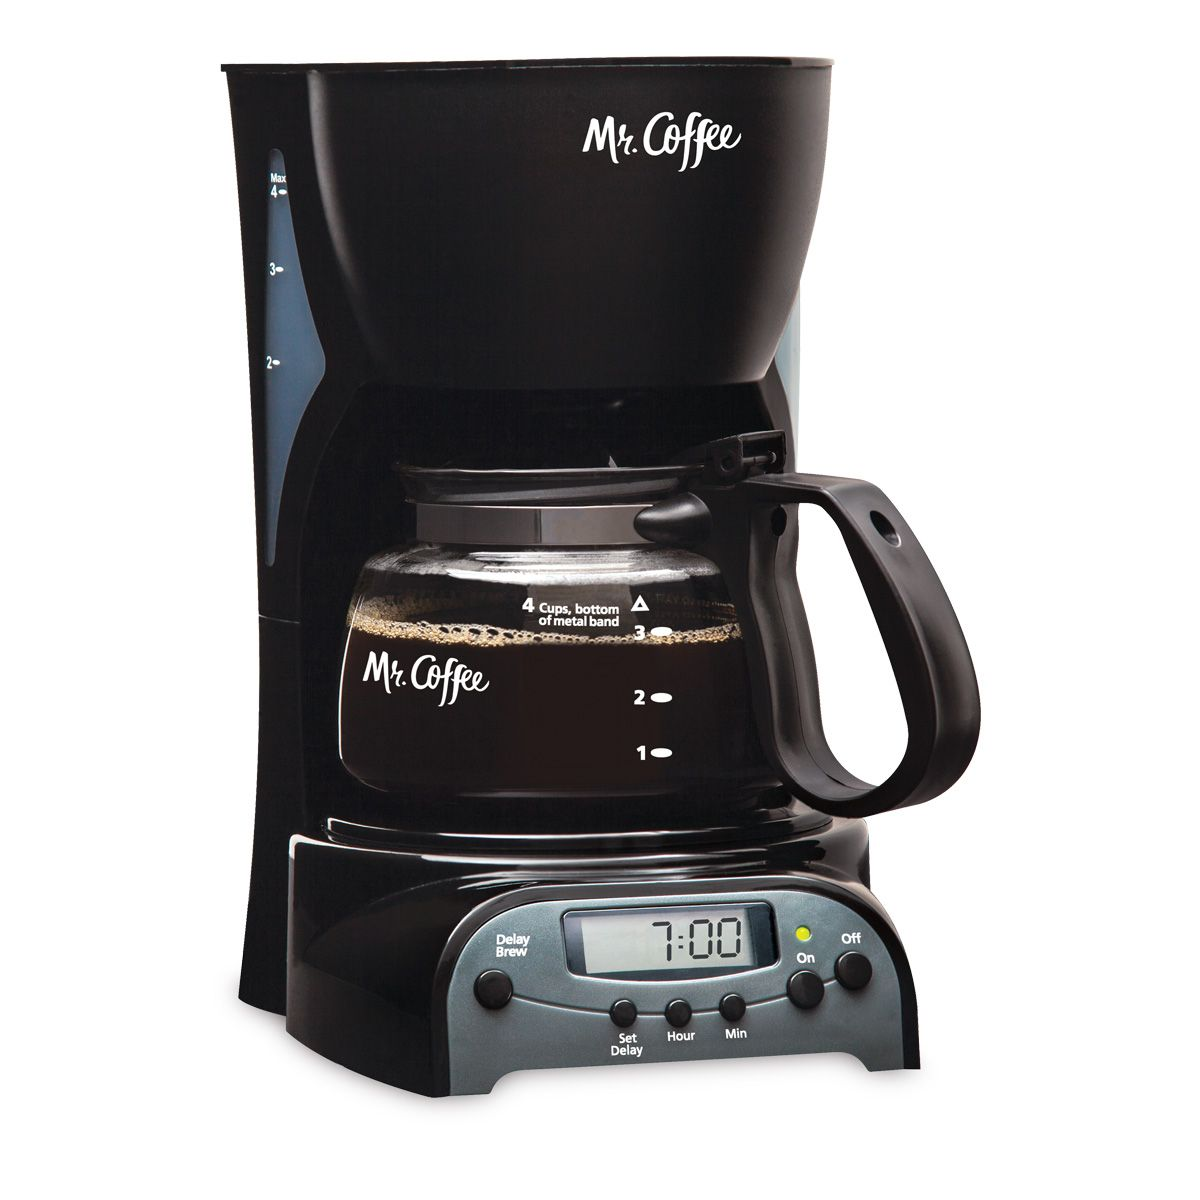 Mr Coffee Simple Brew 4 Cup Programmable Coffee Maker Black Drx5 Rb 0 Mr Coffee Best Coffee Maker 4 Cup Coffee Maker